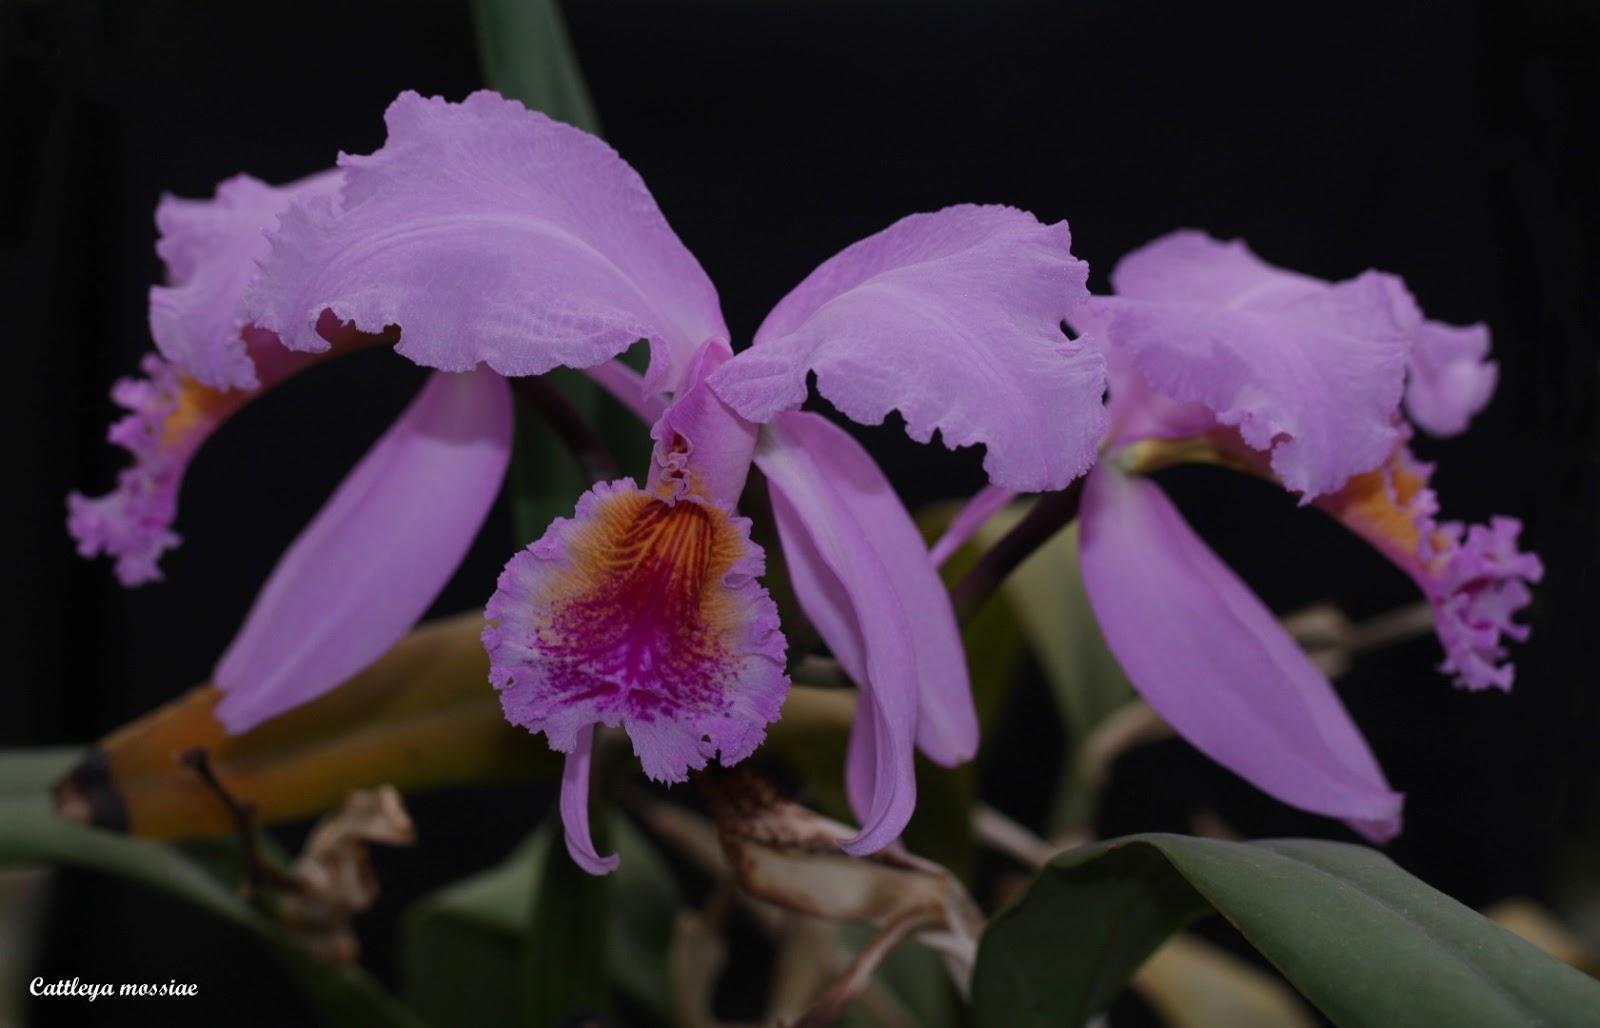 Cattleya mossiae IMG_9126b%2B%2528Large%2529